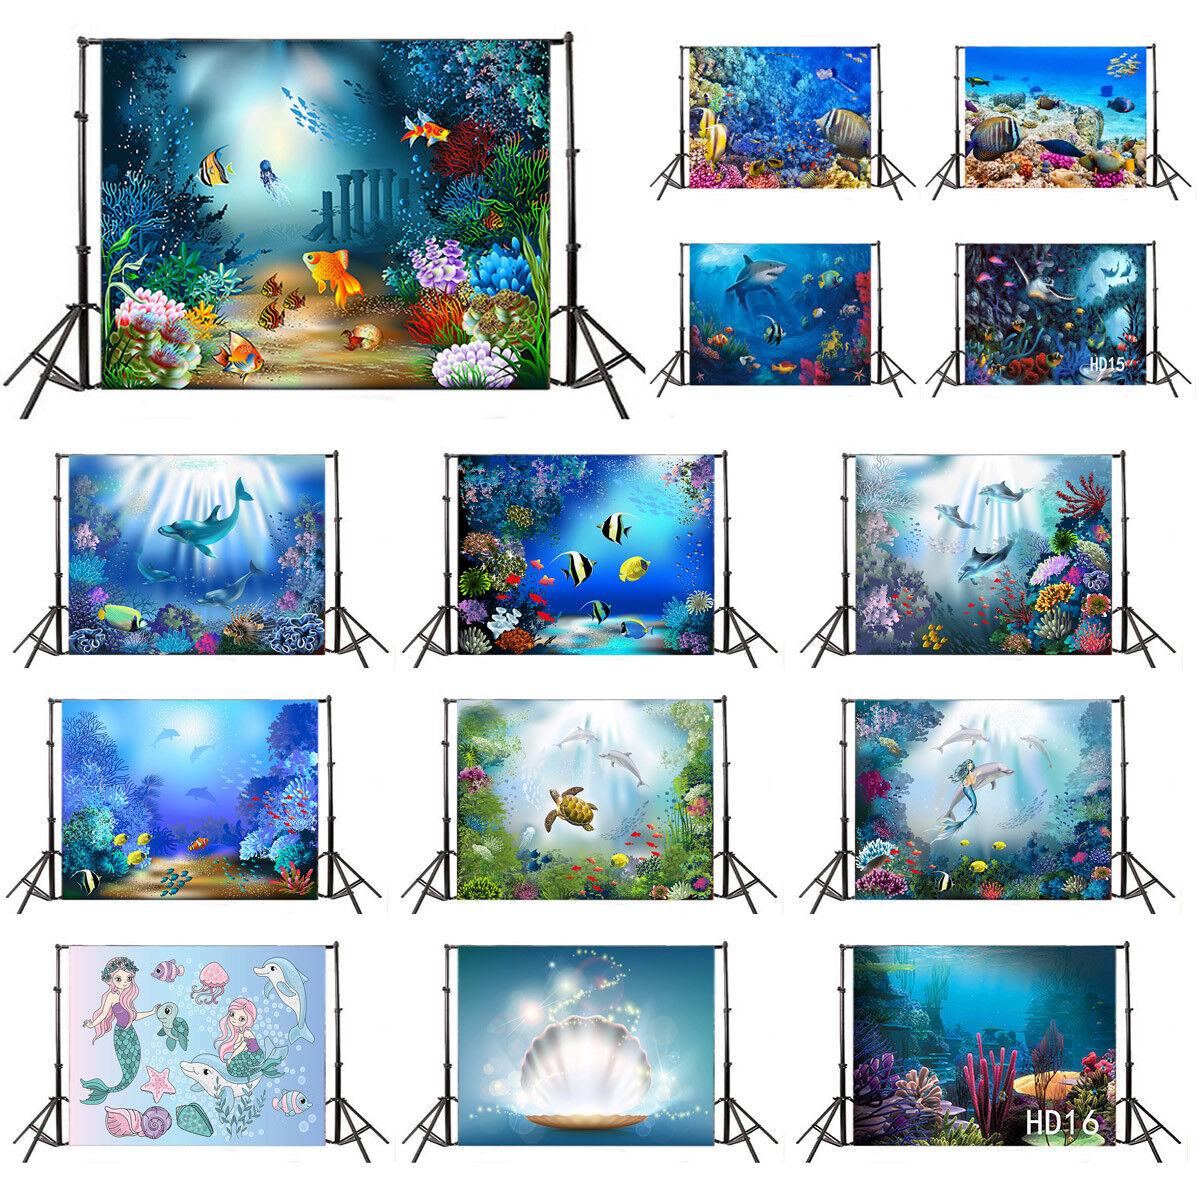 10x8ft Aquarium Background Undersea Dolphin Photography Backdrop Kids Photo Studio Props LHFU081